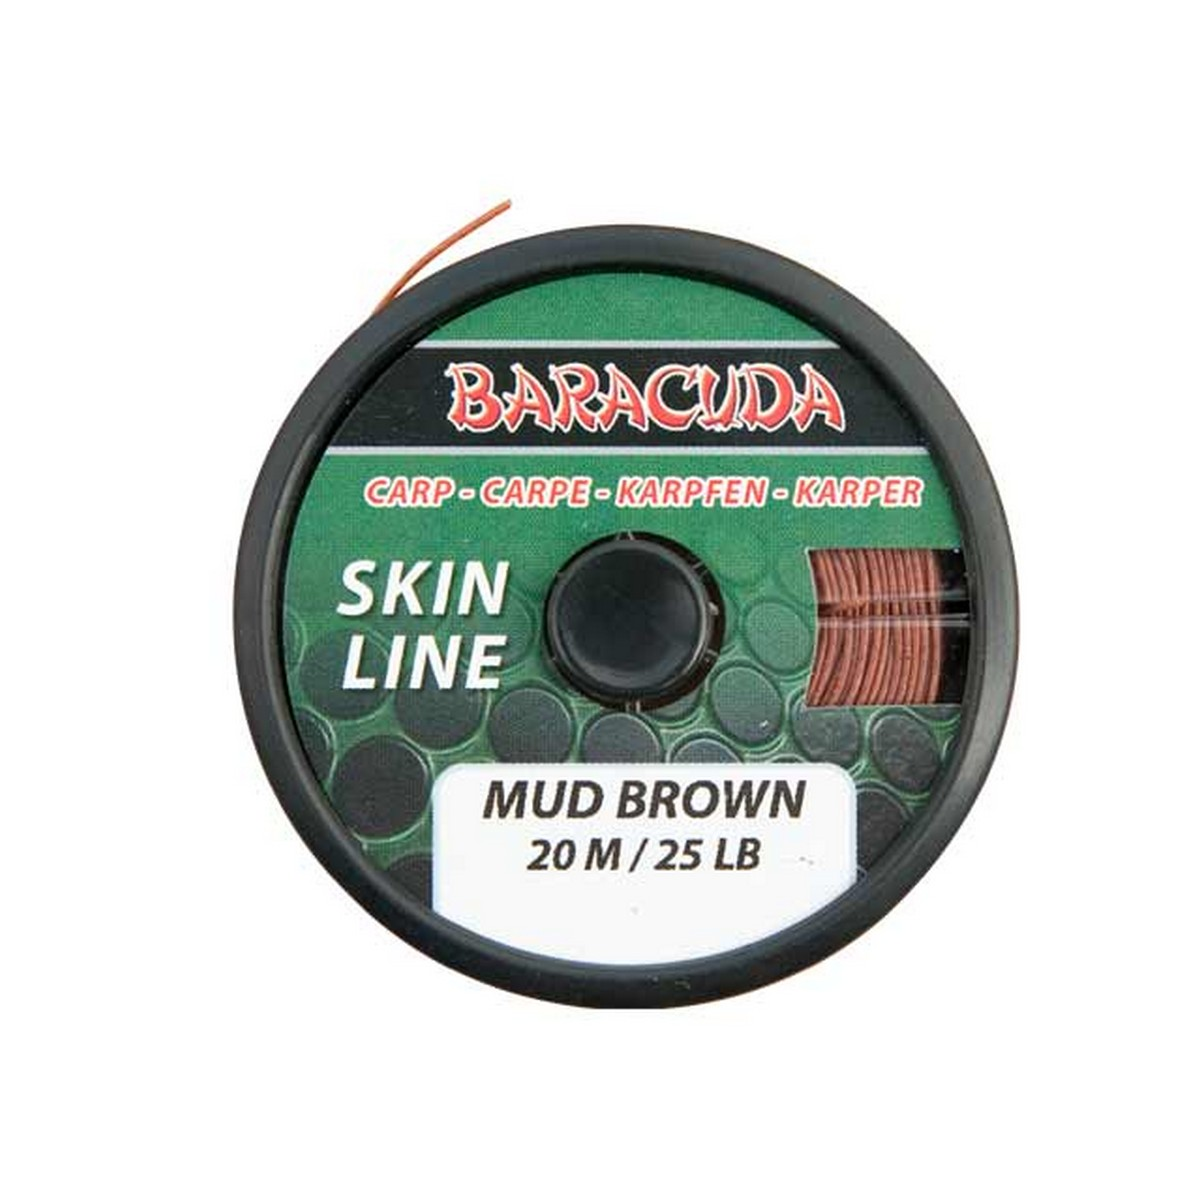 Baracuda Skin Line 20m